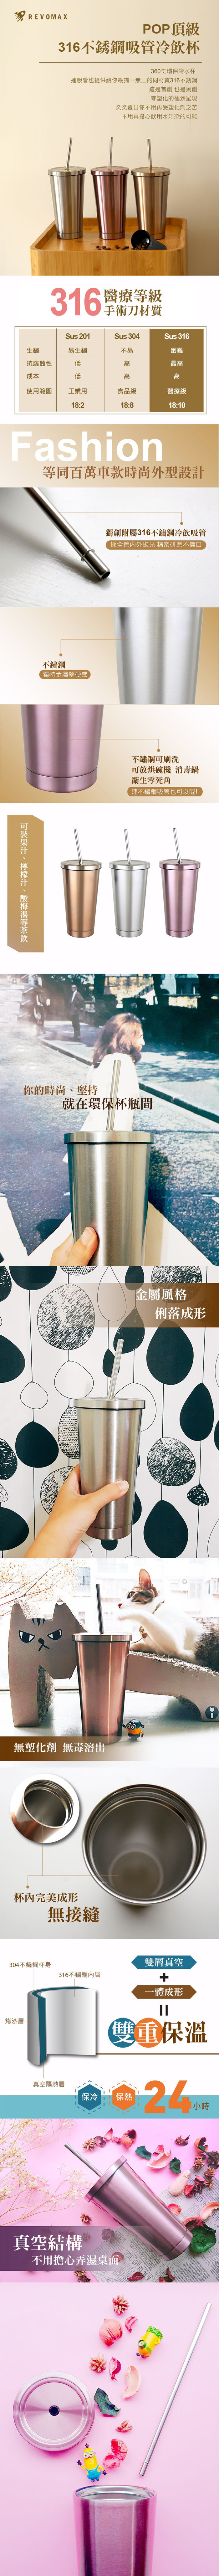 REVOMAX|POP頂級316不鏽鋼吸管冷熱飲杯500ML(3色可選)